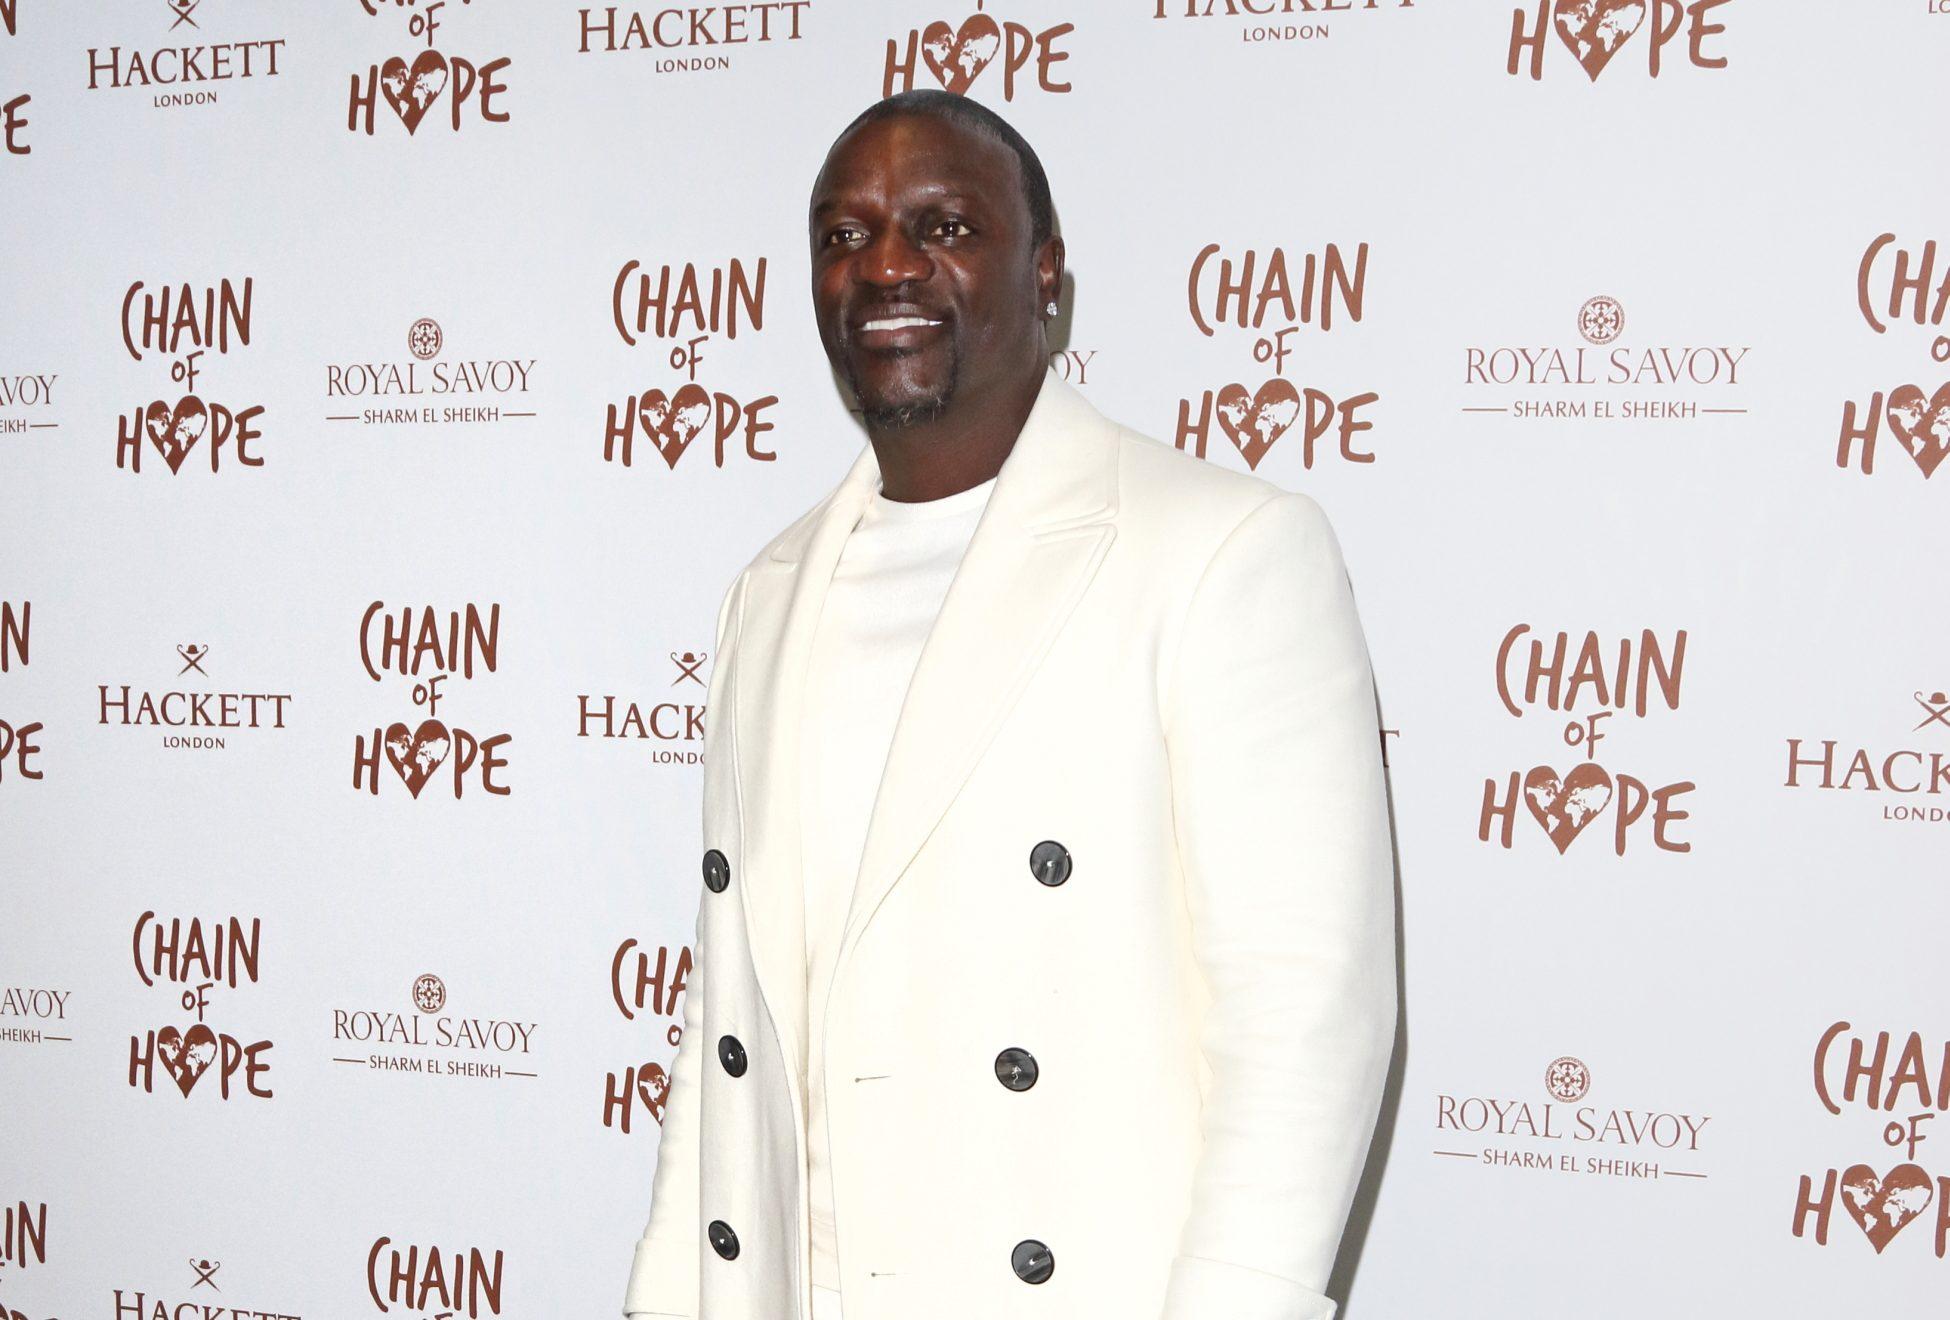 Chain of Hope Gala Ball 2018 - Arrivals